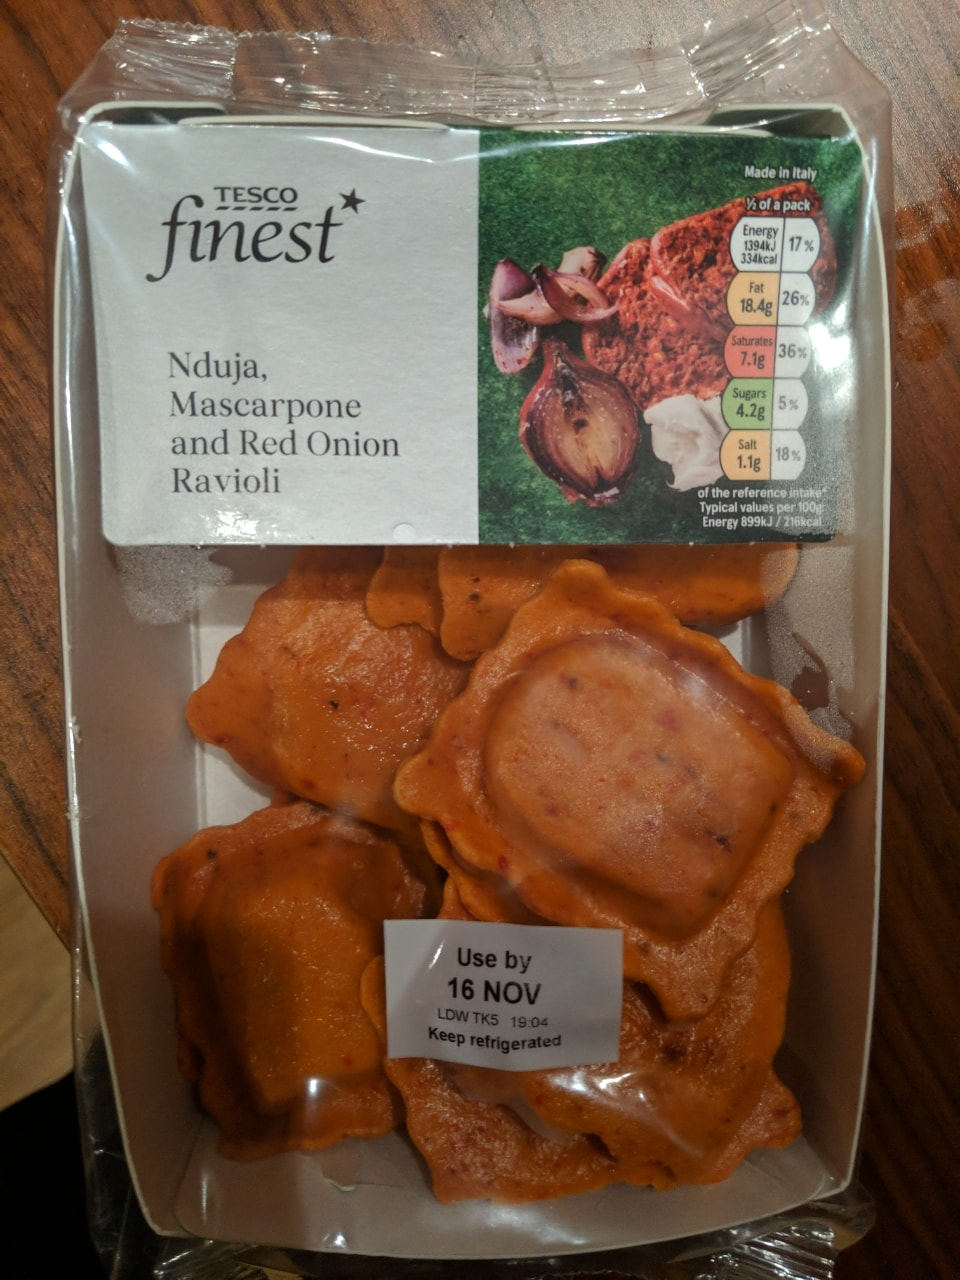 Nduja, mascarpone and red onion ravioli